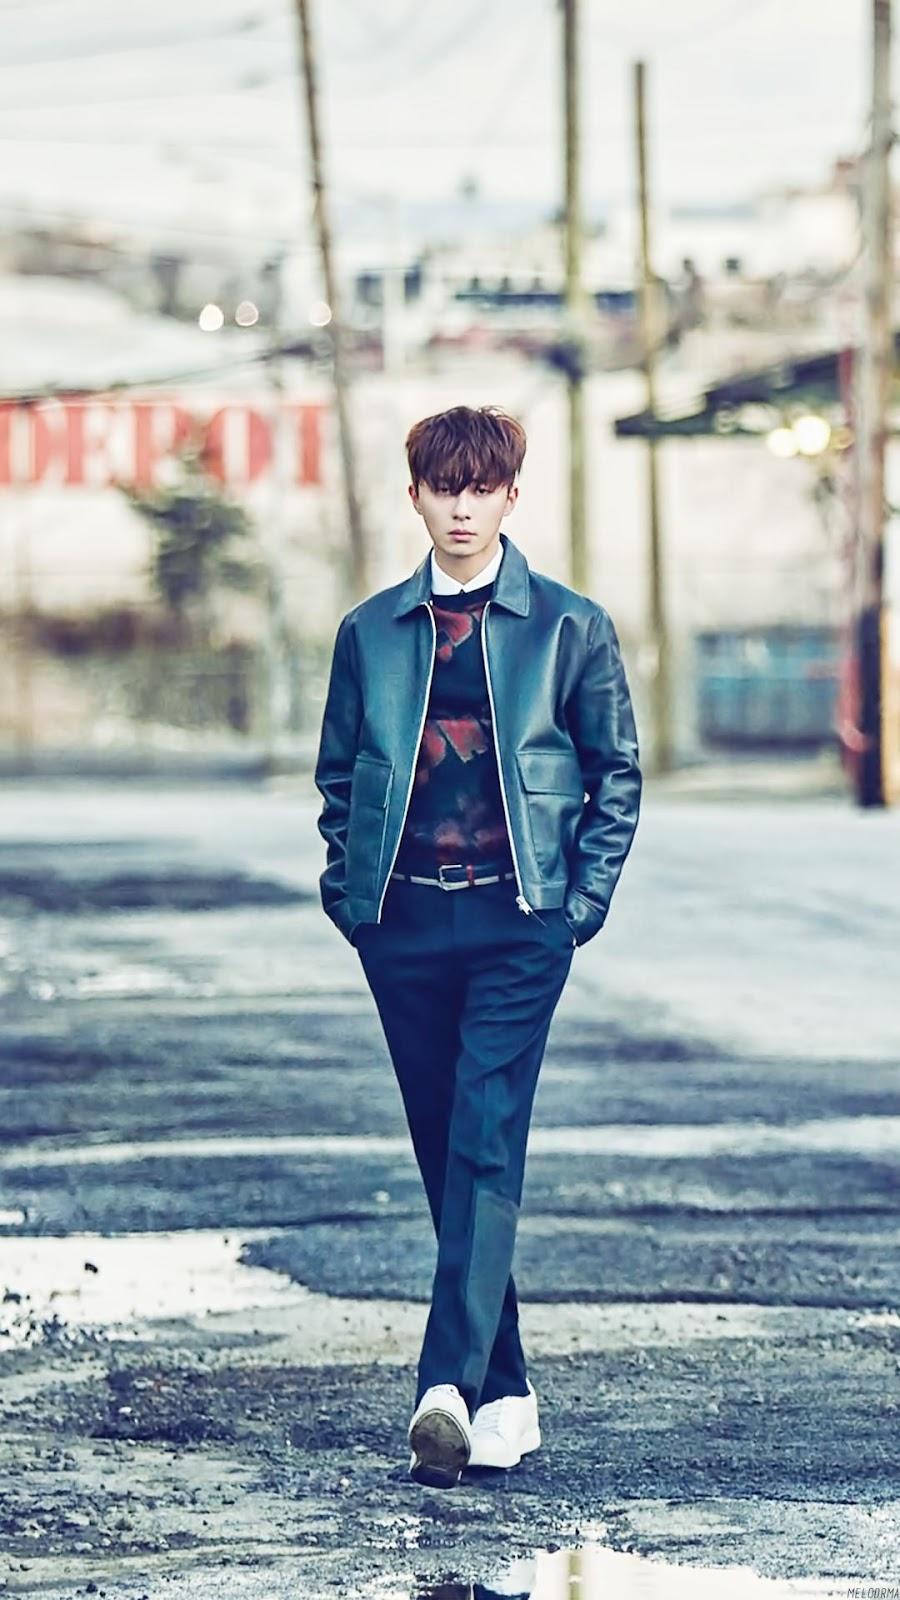 ad1ff3dfcee0 Name the   tall   kpop idols Quiz - By wangfei